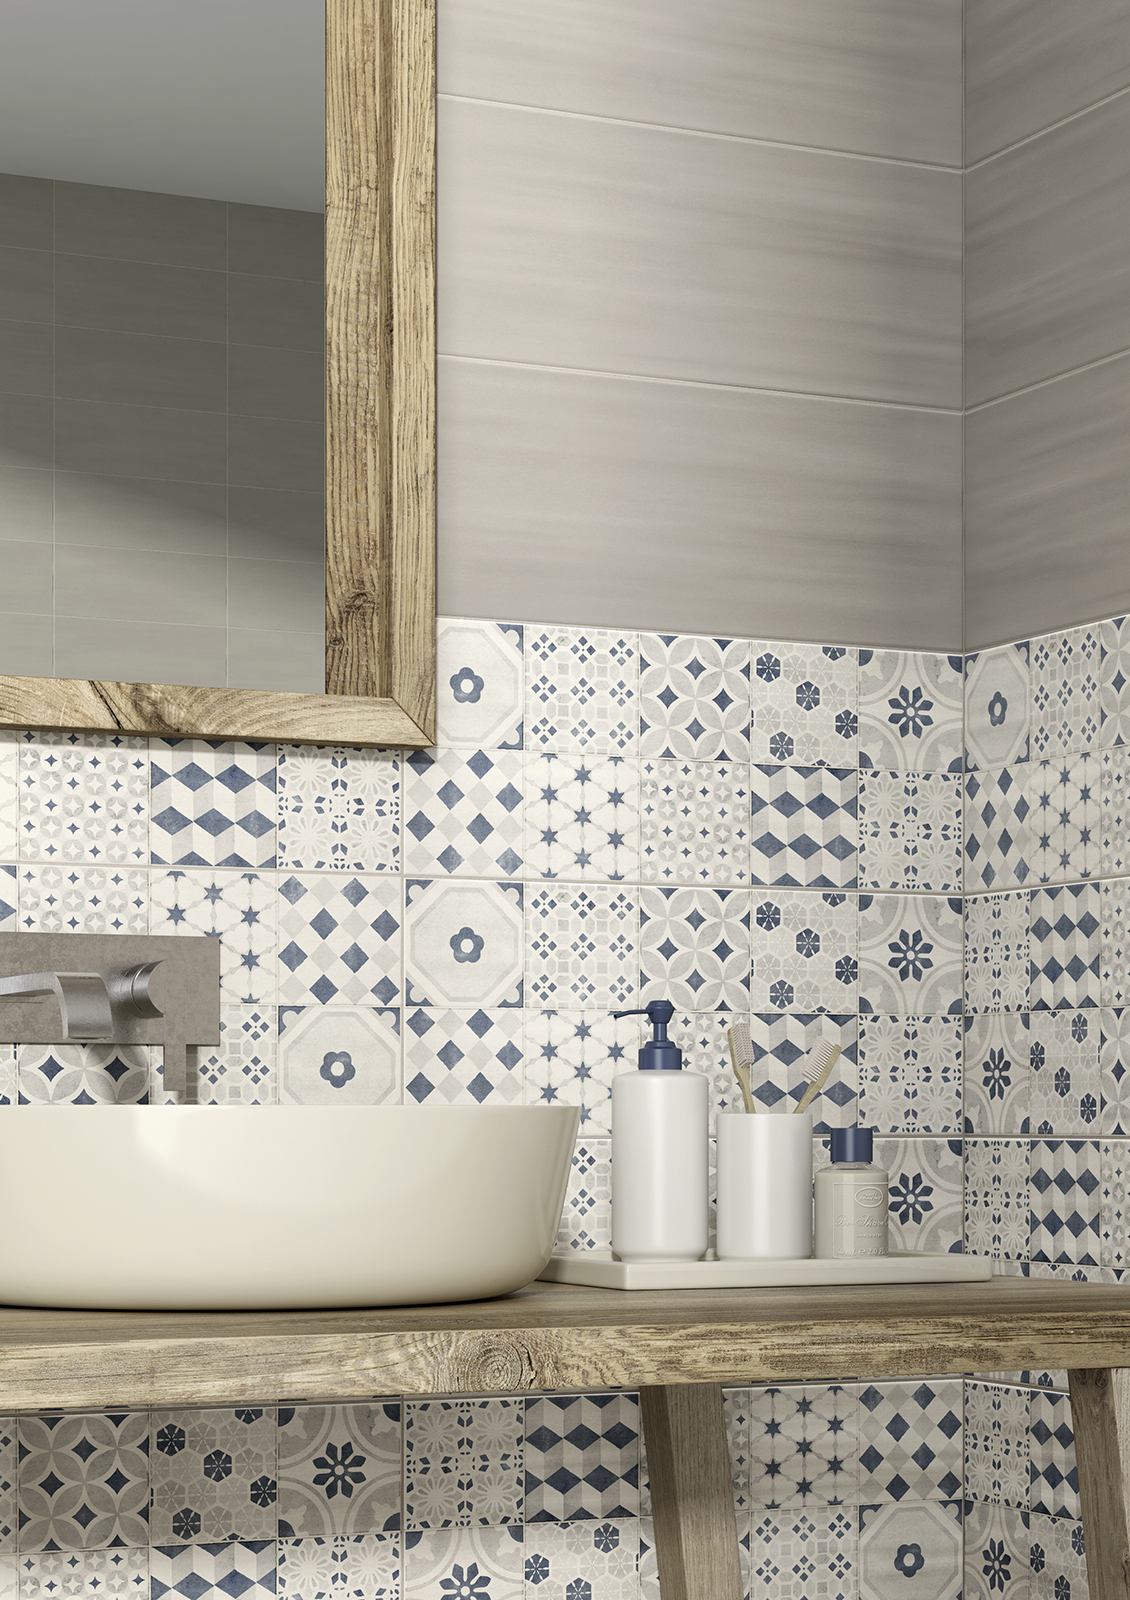 Paint kitchen and bathroom wall tiling marazzi paint ceramic tiles marazzi7065 dailygadgetfo Gallery